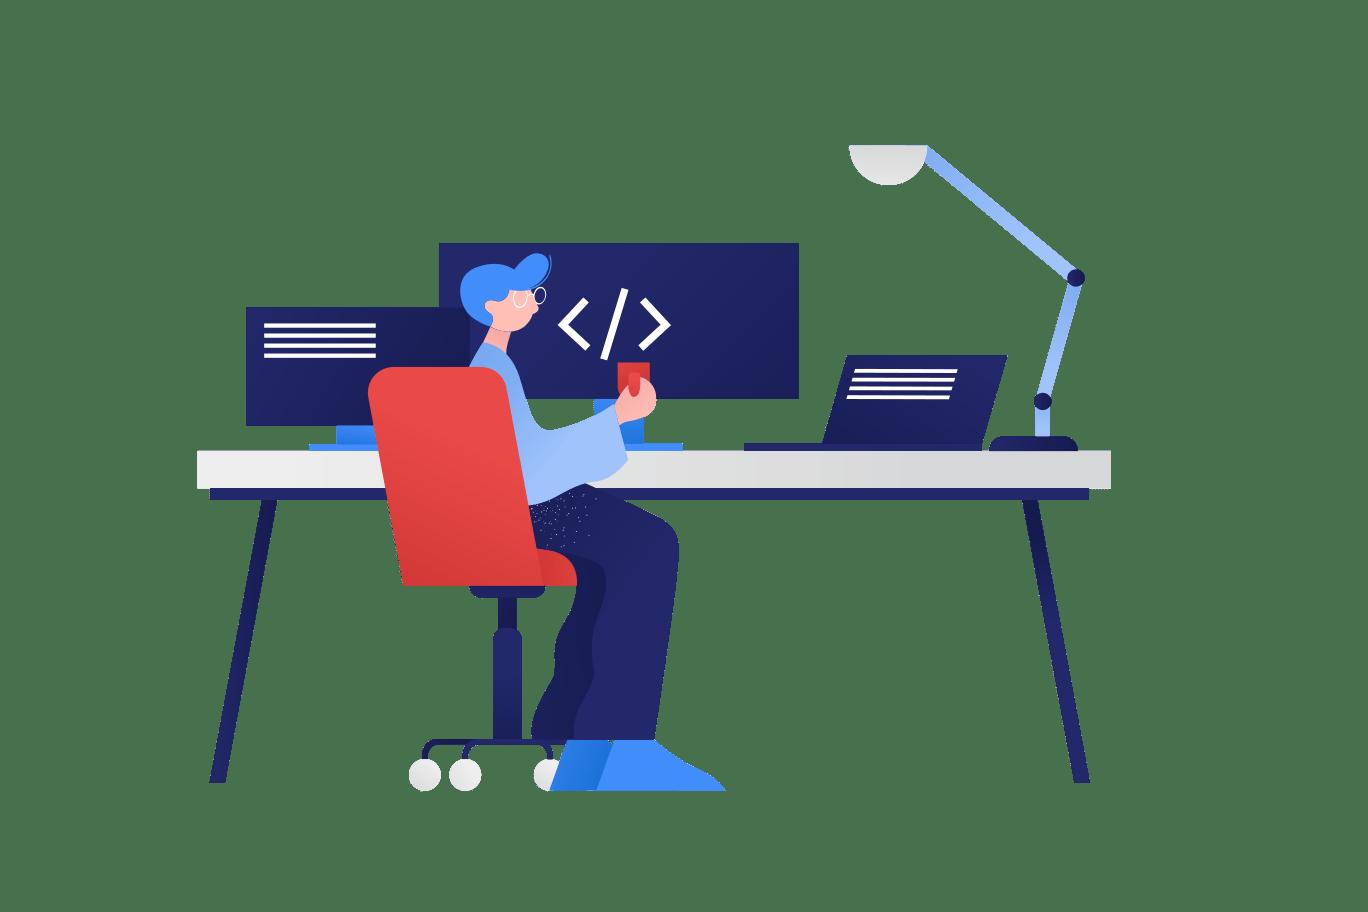 Development in Node.js